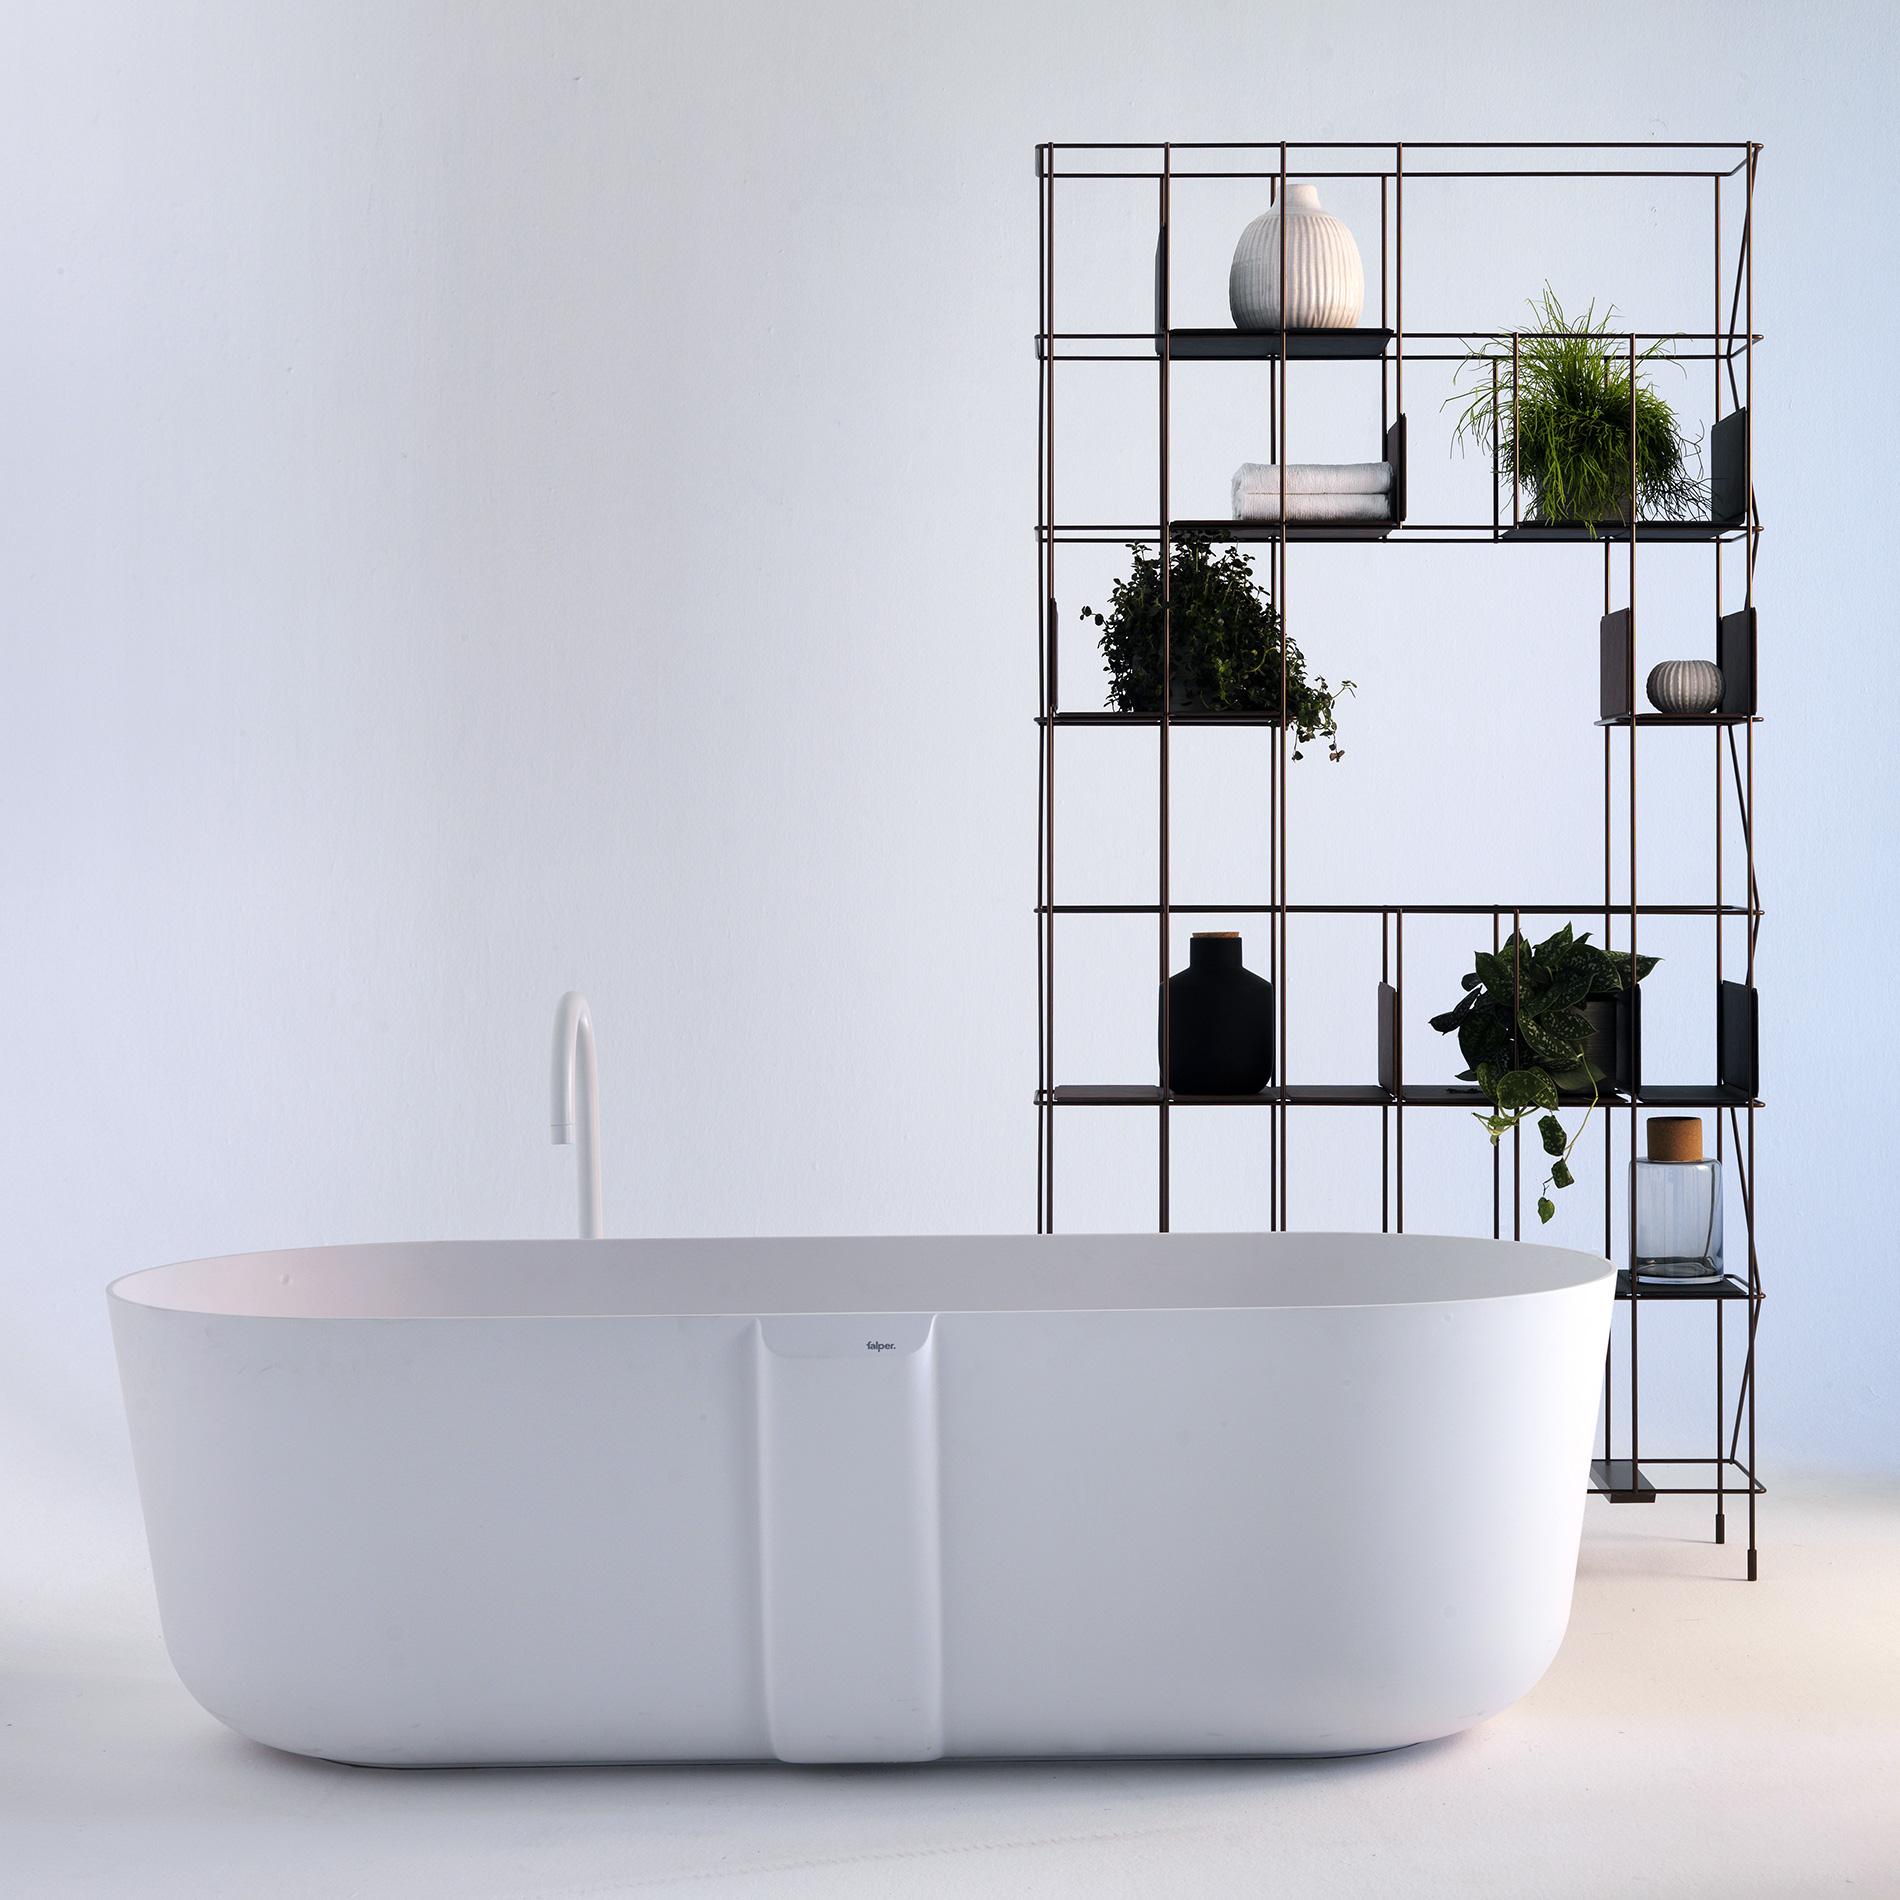 Nicos-International-home-products-Falper-tub-1